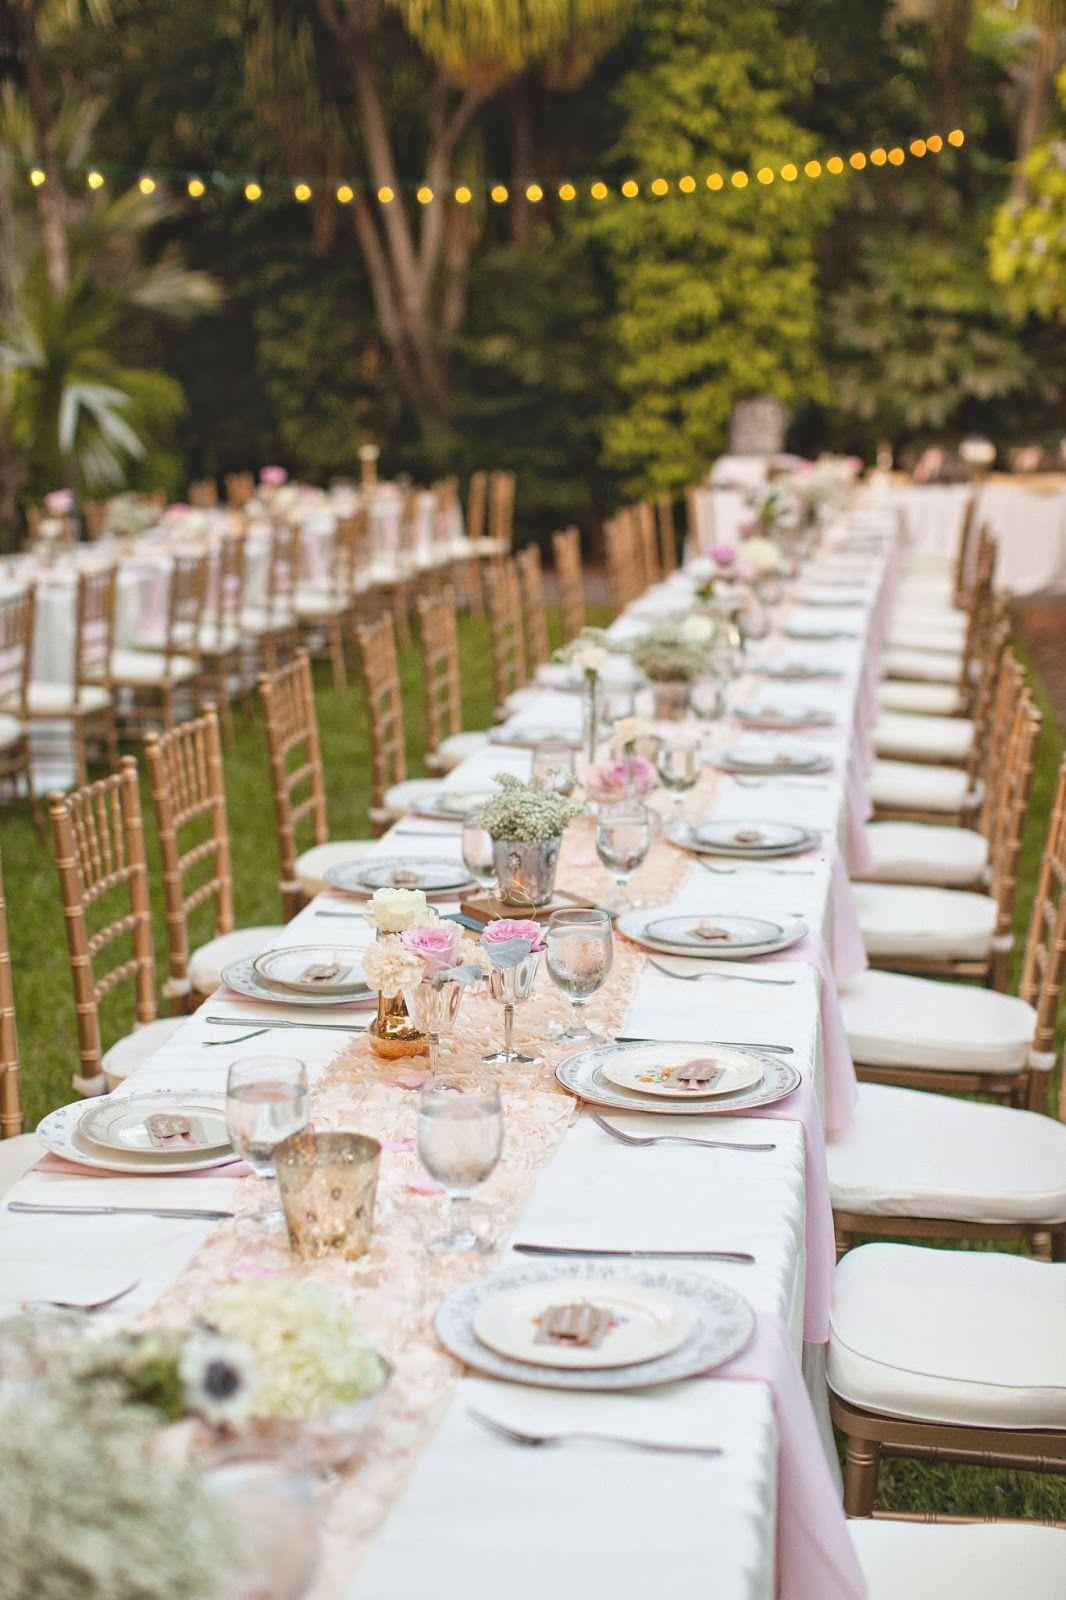 Ernest Hemingway Decorating Style Lana And Bryans Wedding At The Hemingway House In Key West Fl